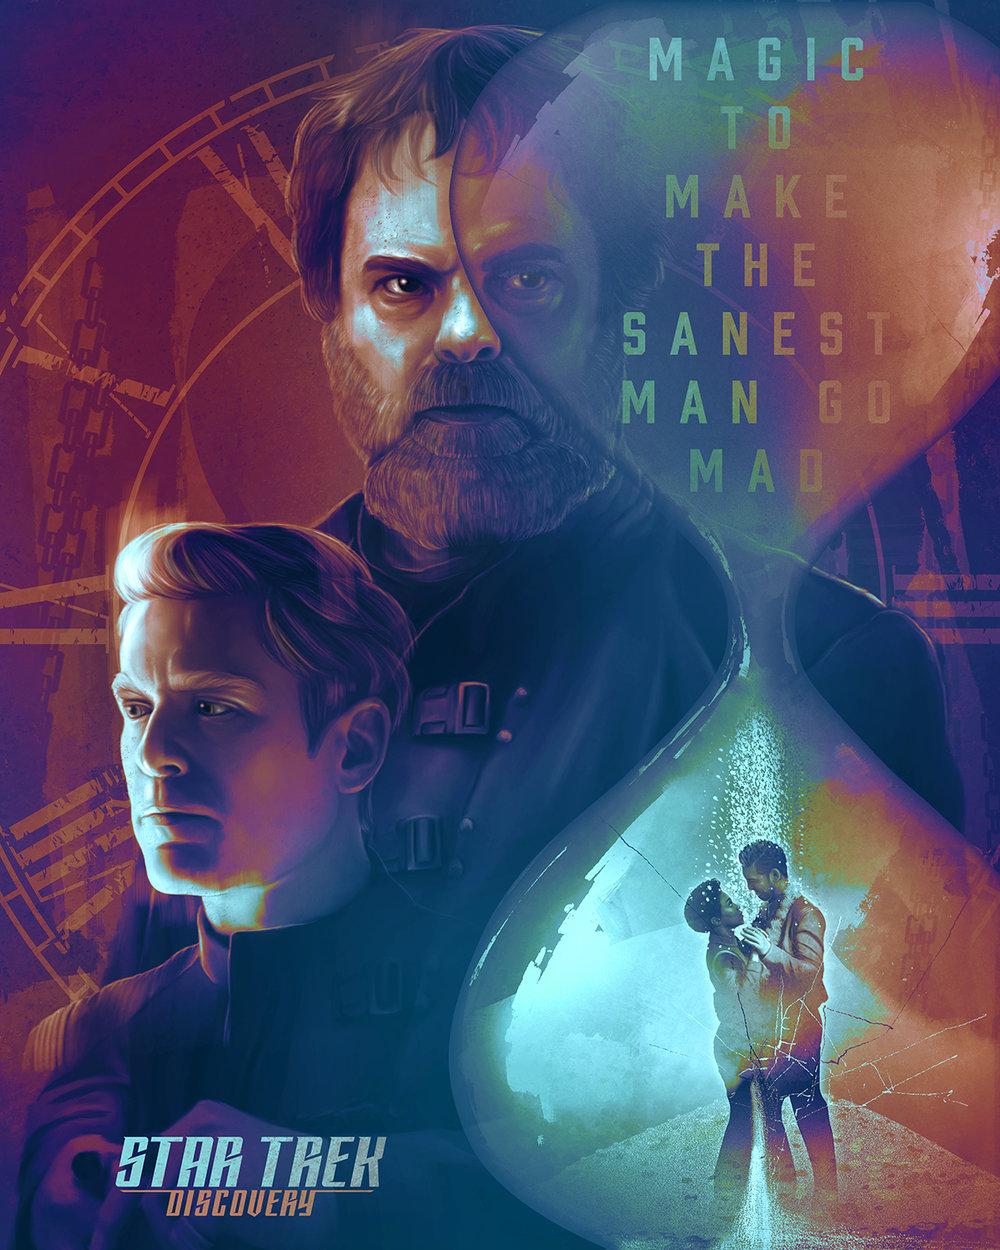 Star Trek Discovery Season 1 Episode 7 Magic To Make The Sanest Man